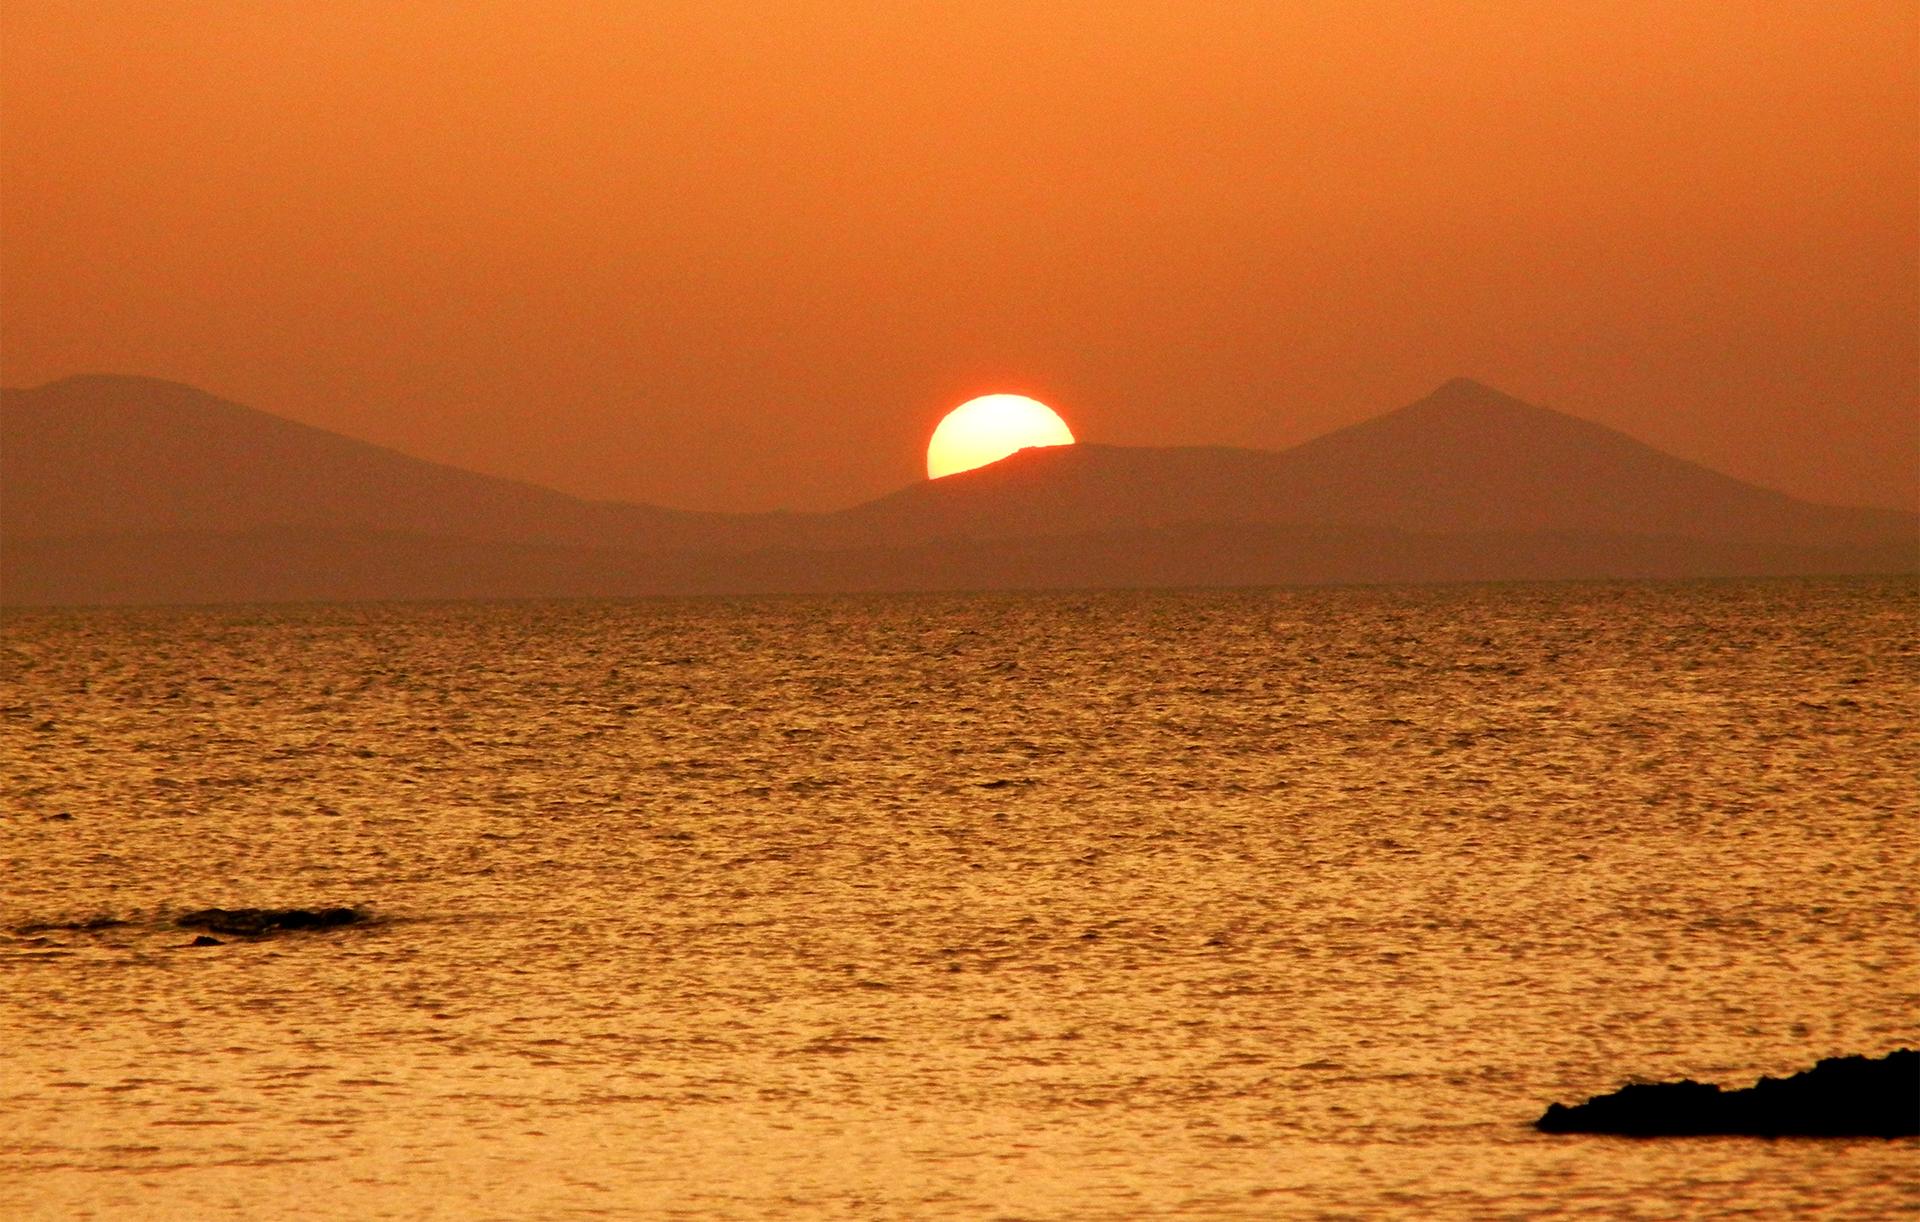 Burnt orange sunset views from Oia, greek island destination Santorini